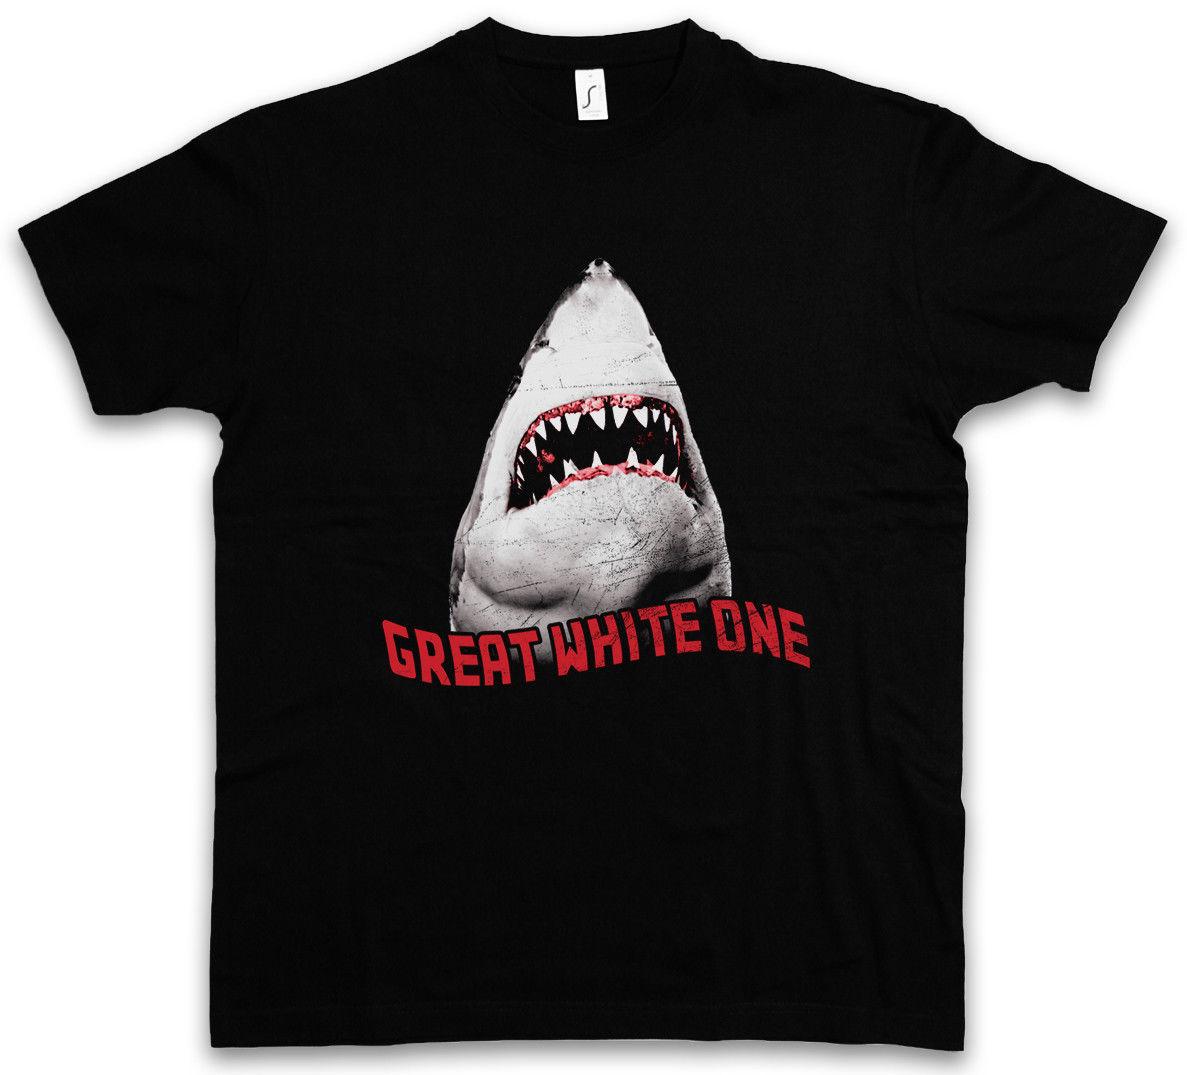 Tiburón Blanco II camiseta tiburón surfista buzo Hawai ataque monstruo gigante asesino camiseta hombres camiseta marca ropa divertida camiseta